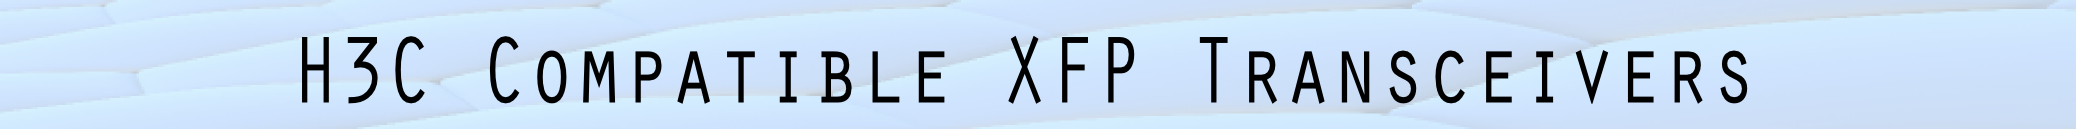 H3C 10-Gigabit Ethernet Fiber Optical XFP Transceiver Modules